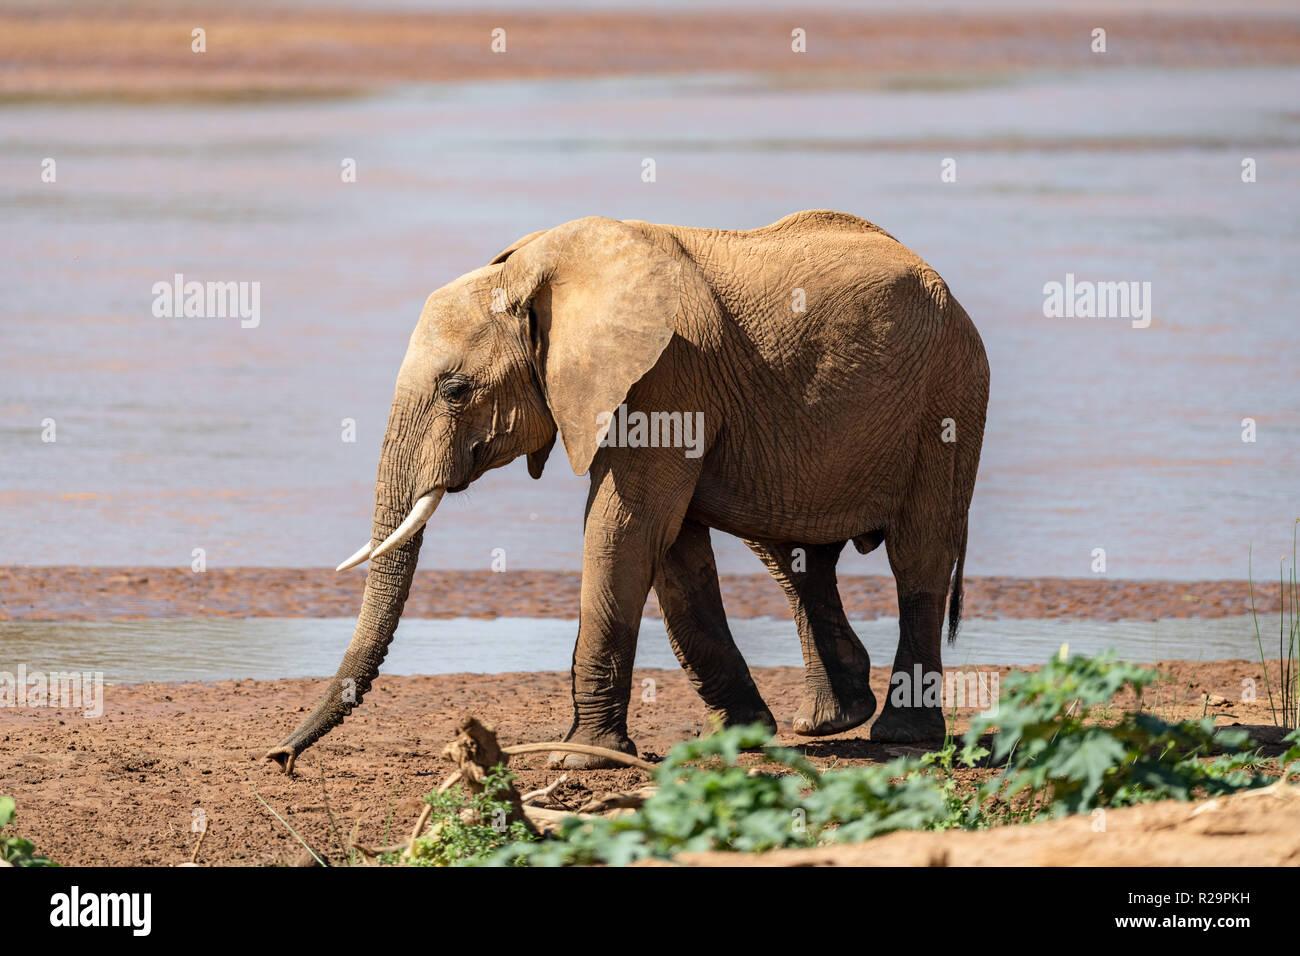 Immature African elephants (Loxodonta) in Kenya. - Stock Image